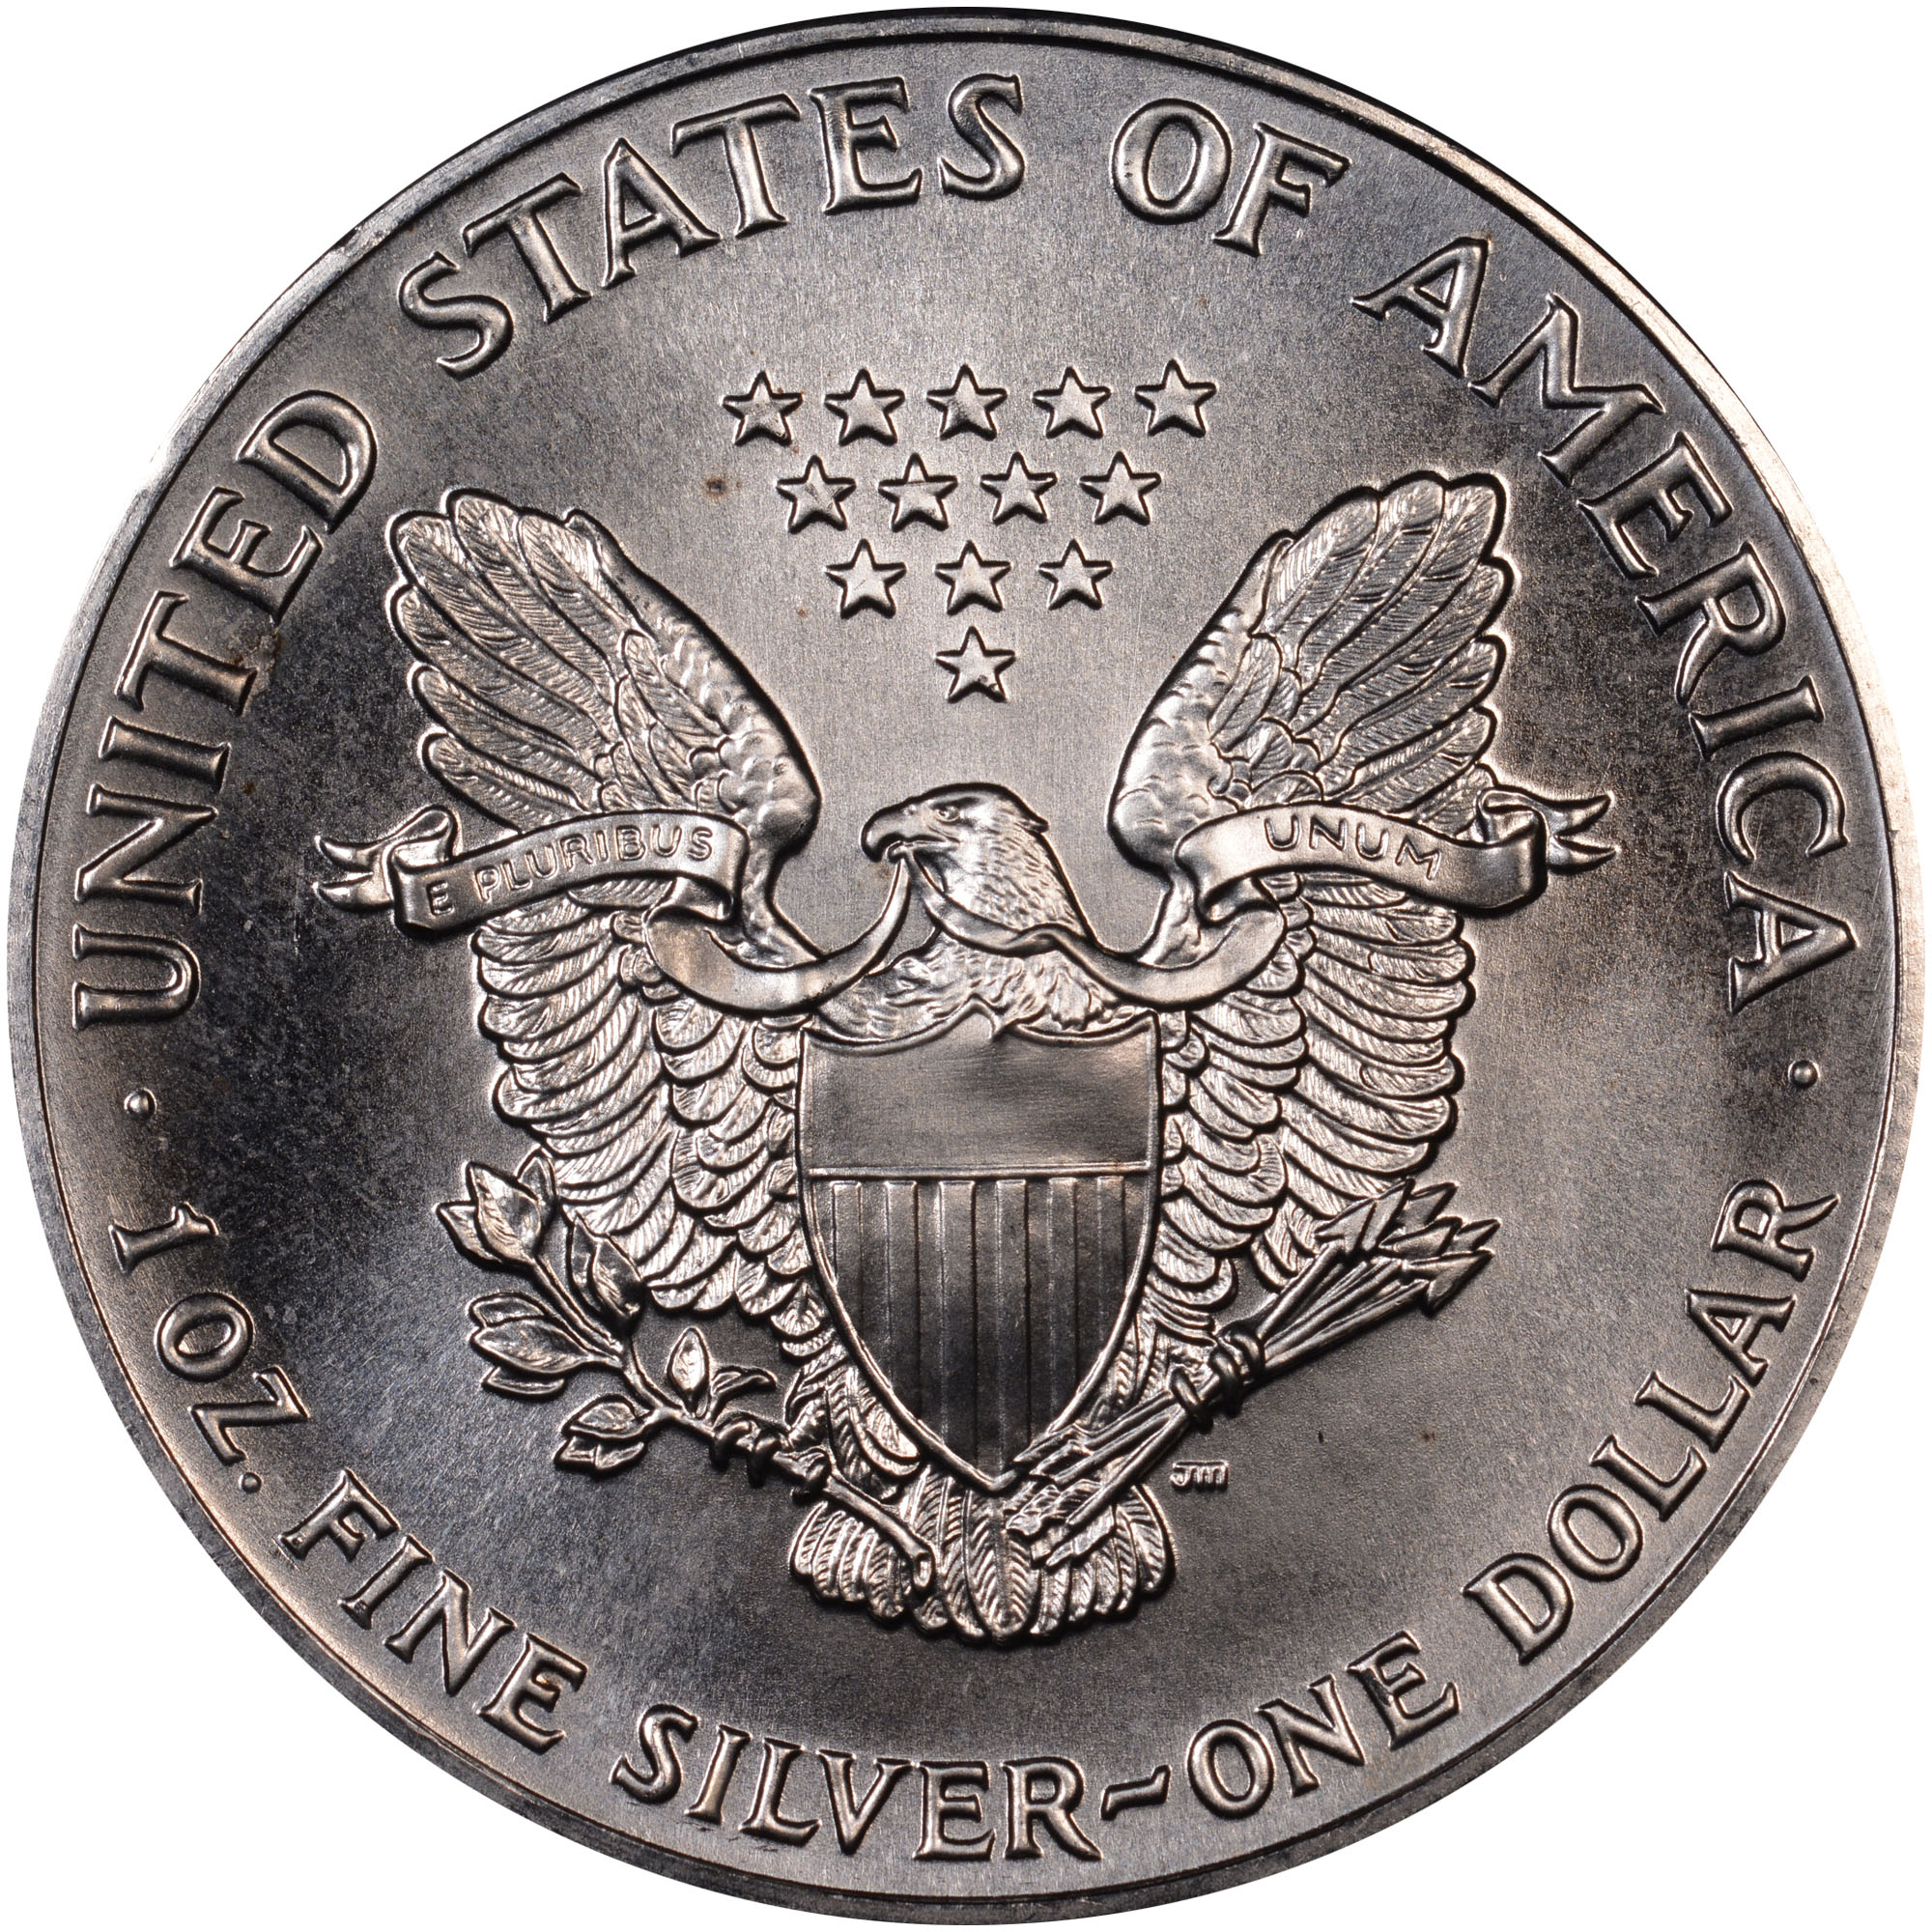 1990 Eagle S$1 MS Silver Eagles | NGC